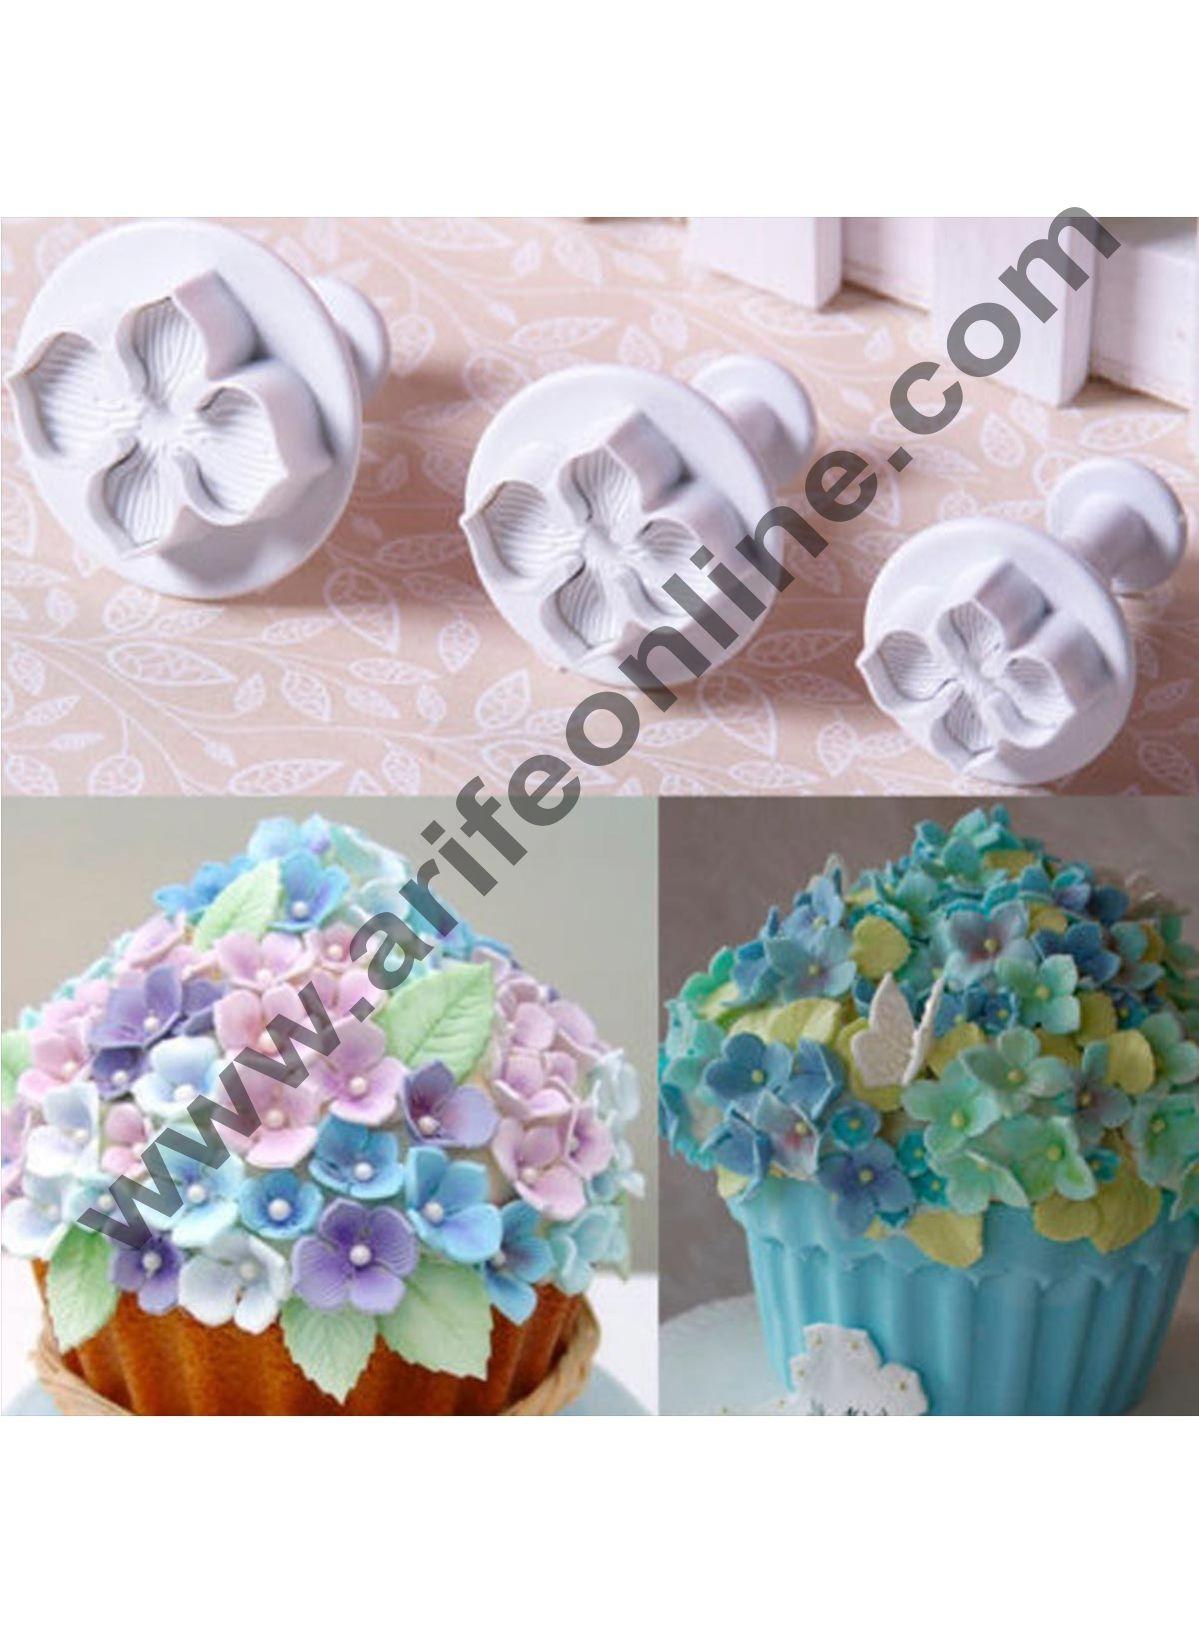 Cake Decor 3pcs Hydrangea Veined Laurustinus Flower Cake Sugar Craft Fondant Plunger Cutters